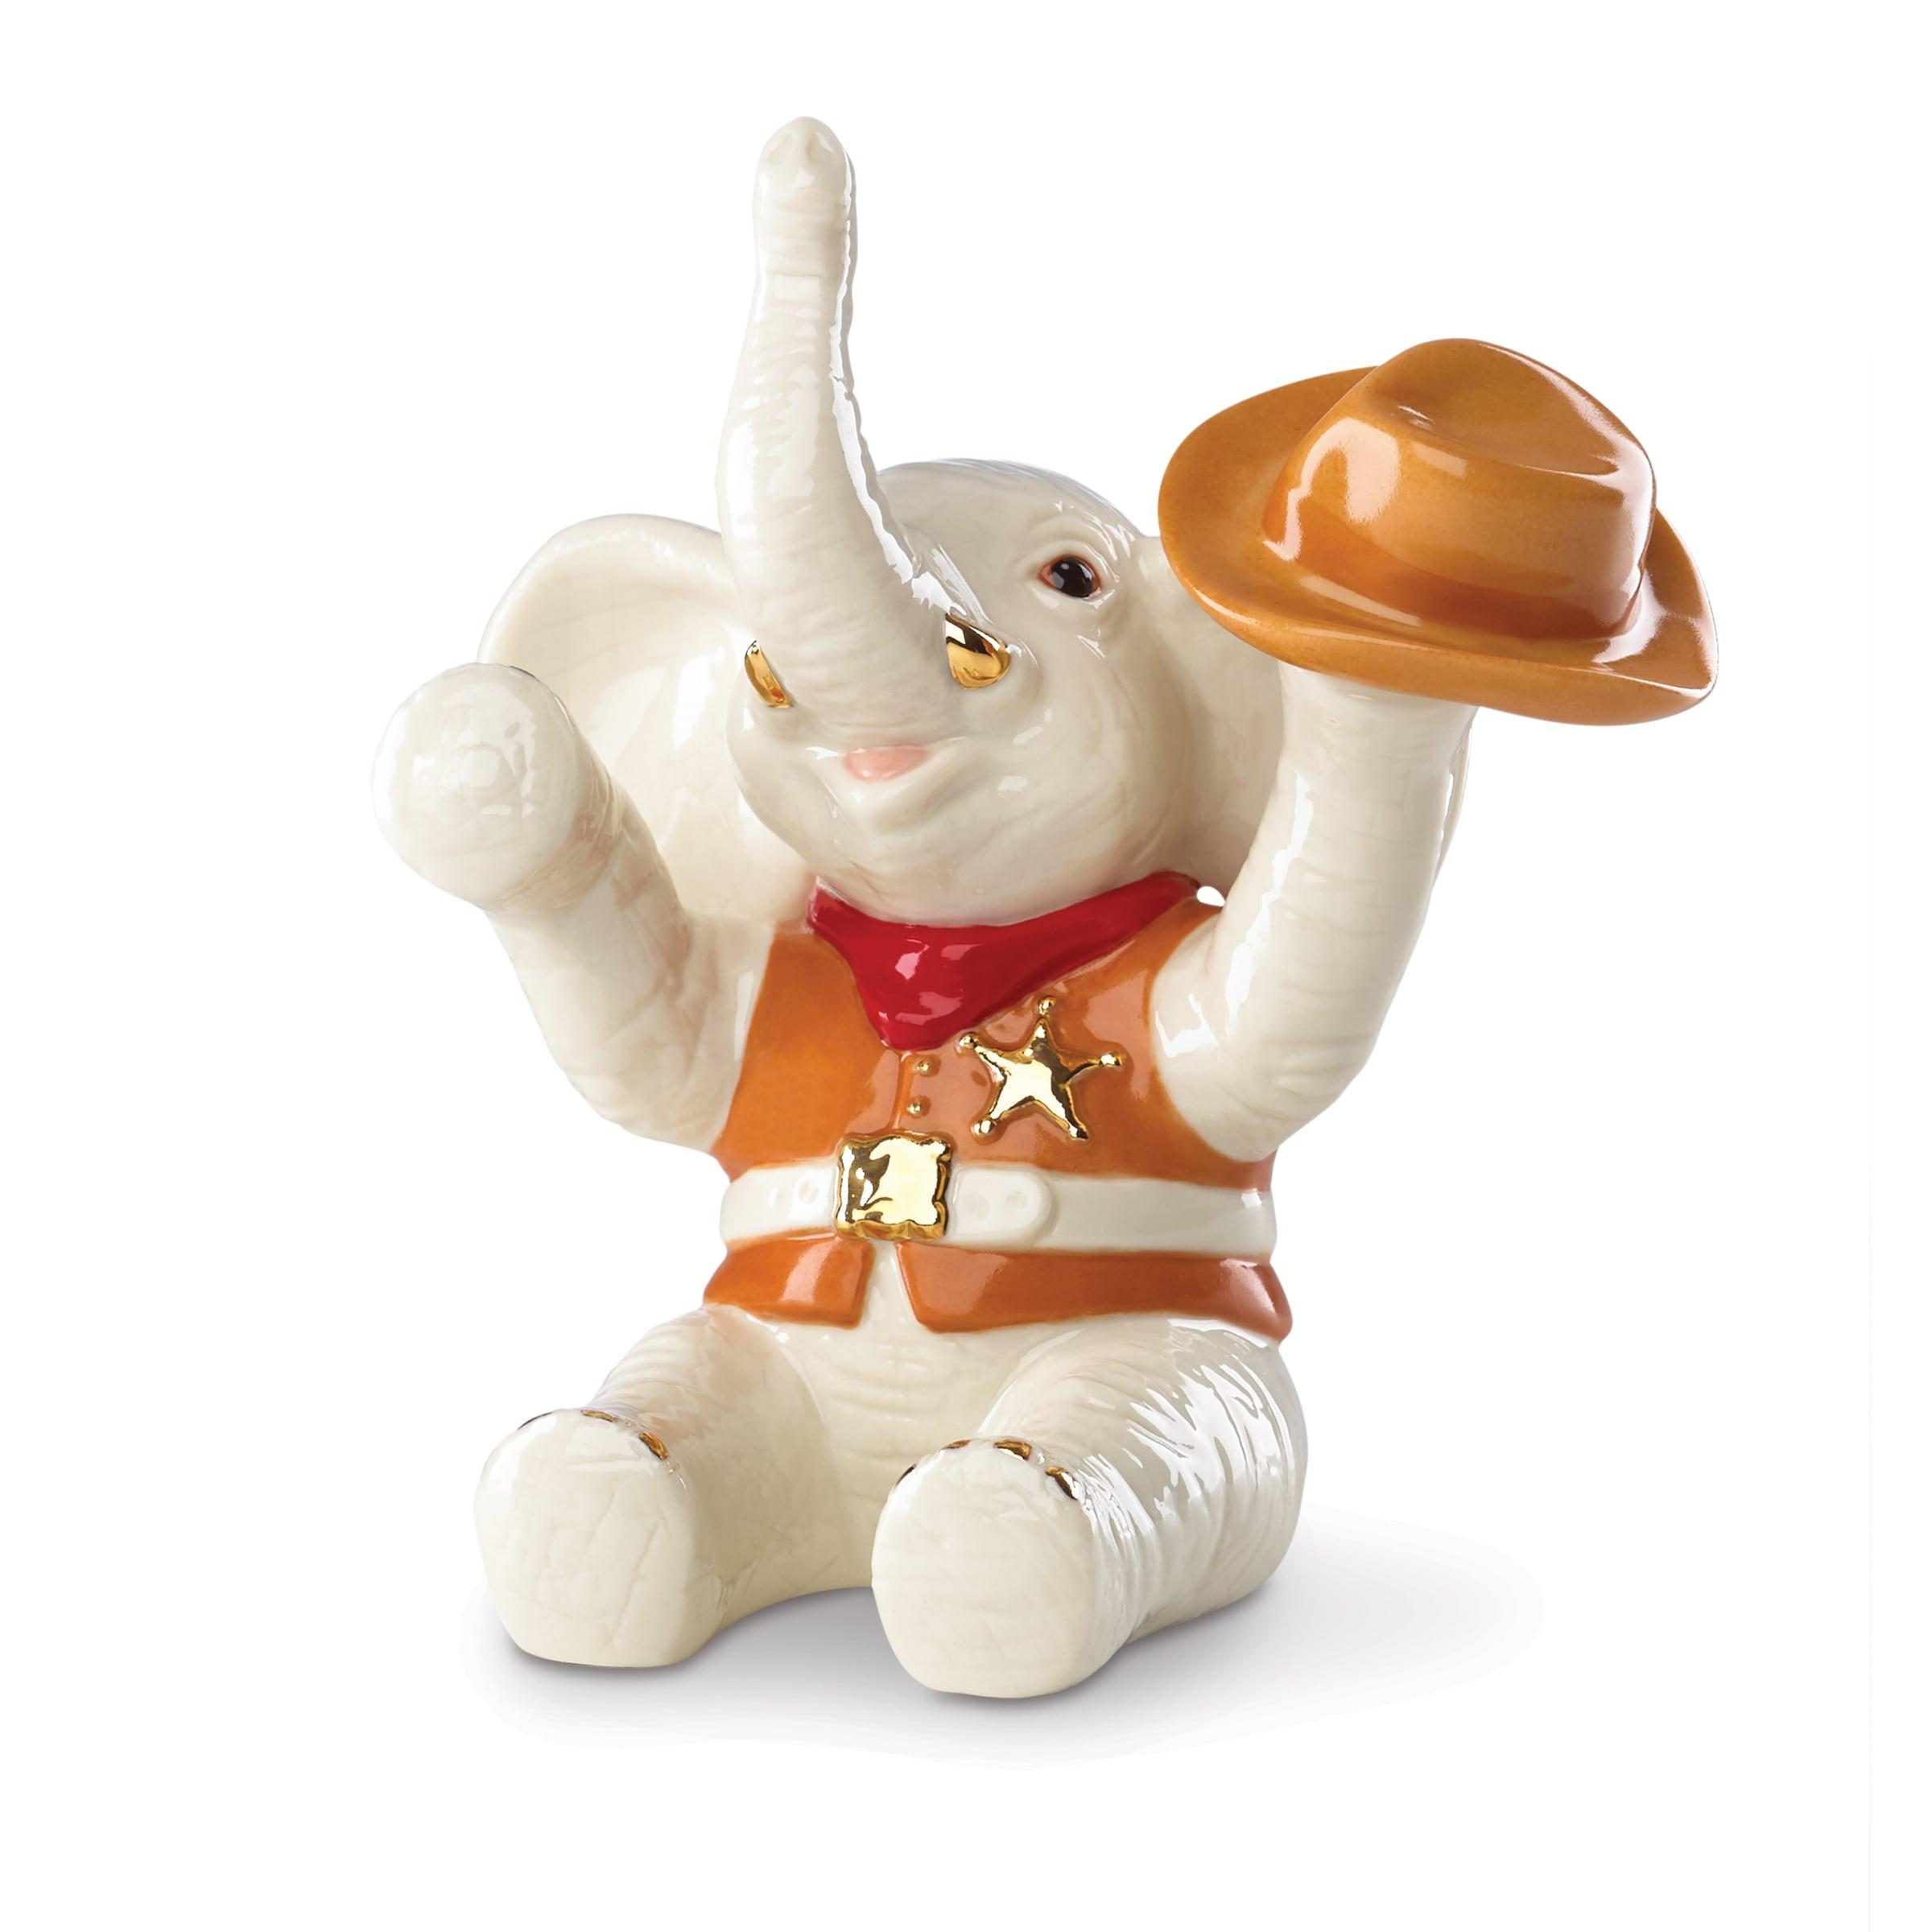 Lenox Cowboy Up Porcelain Elephant Figurine (Lenox Classi...